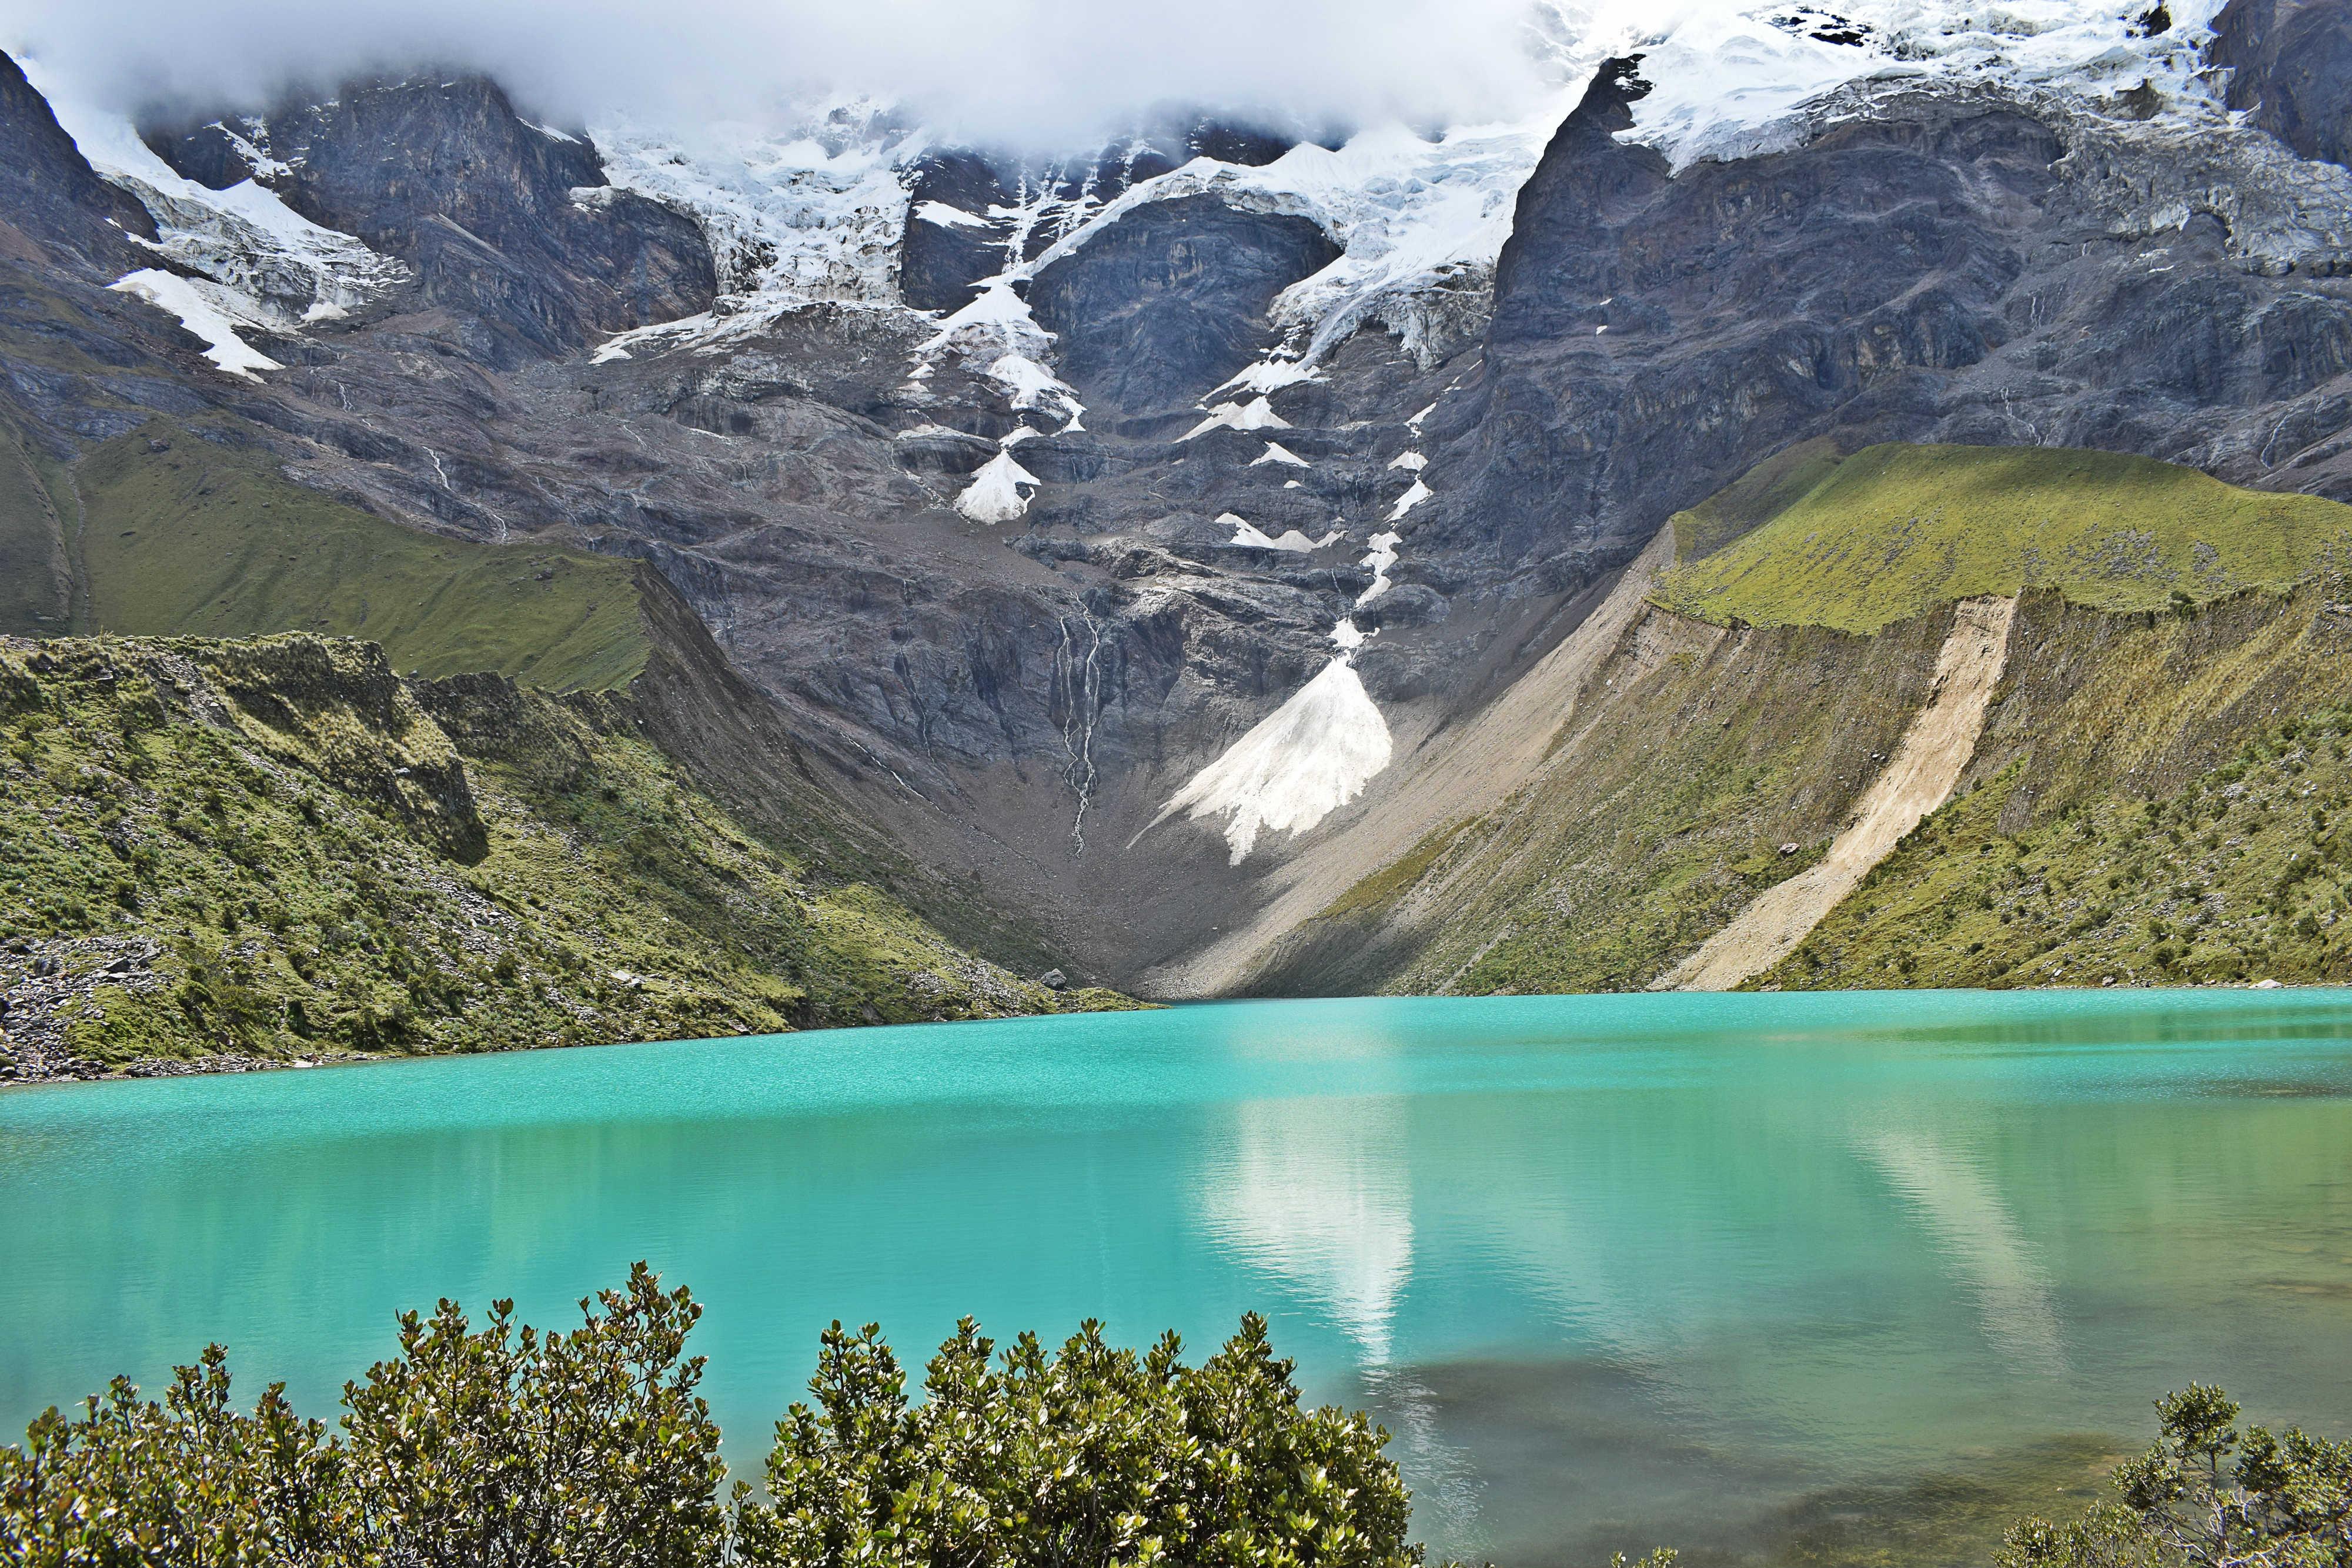 Salktantay to Machu Picchu Trek 3